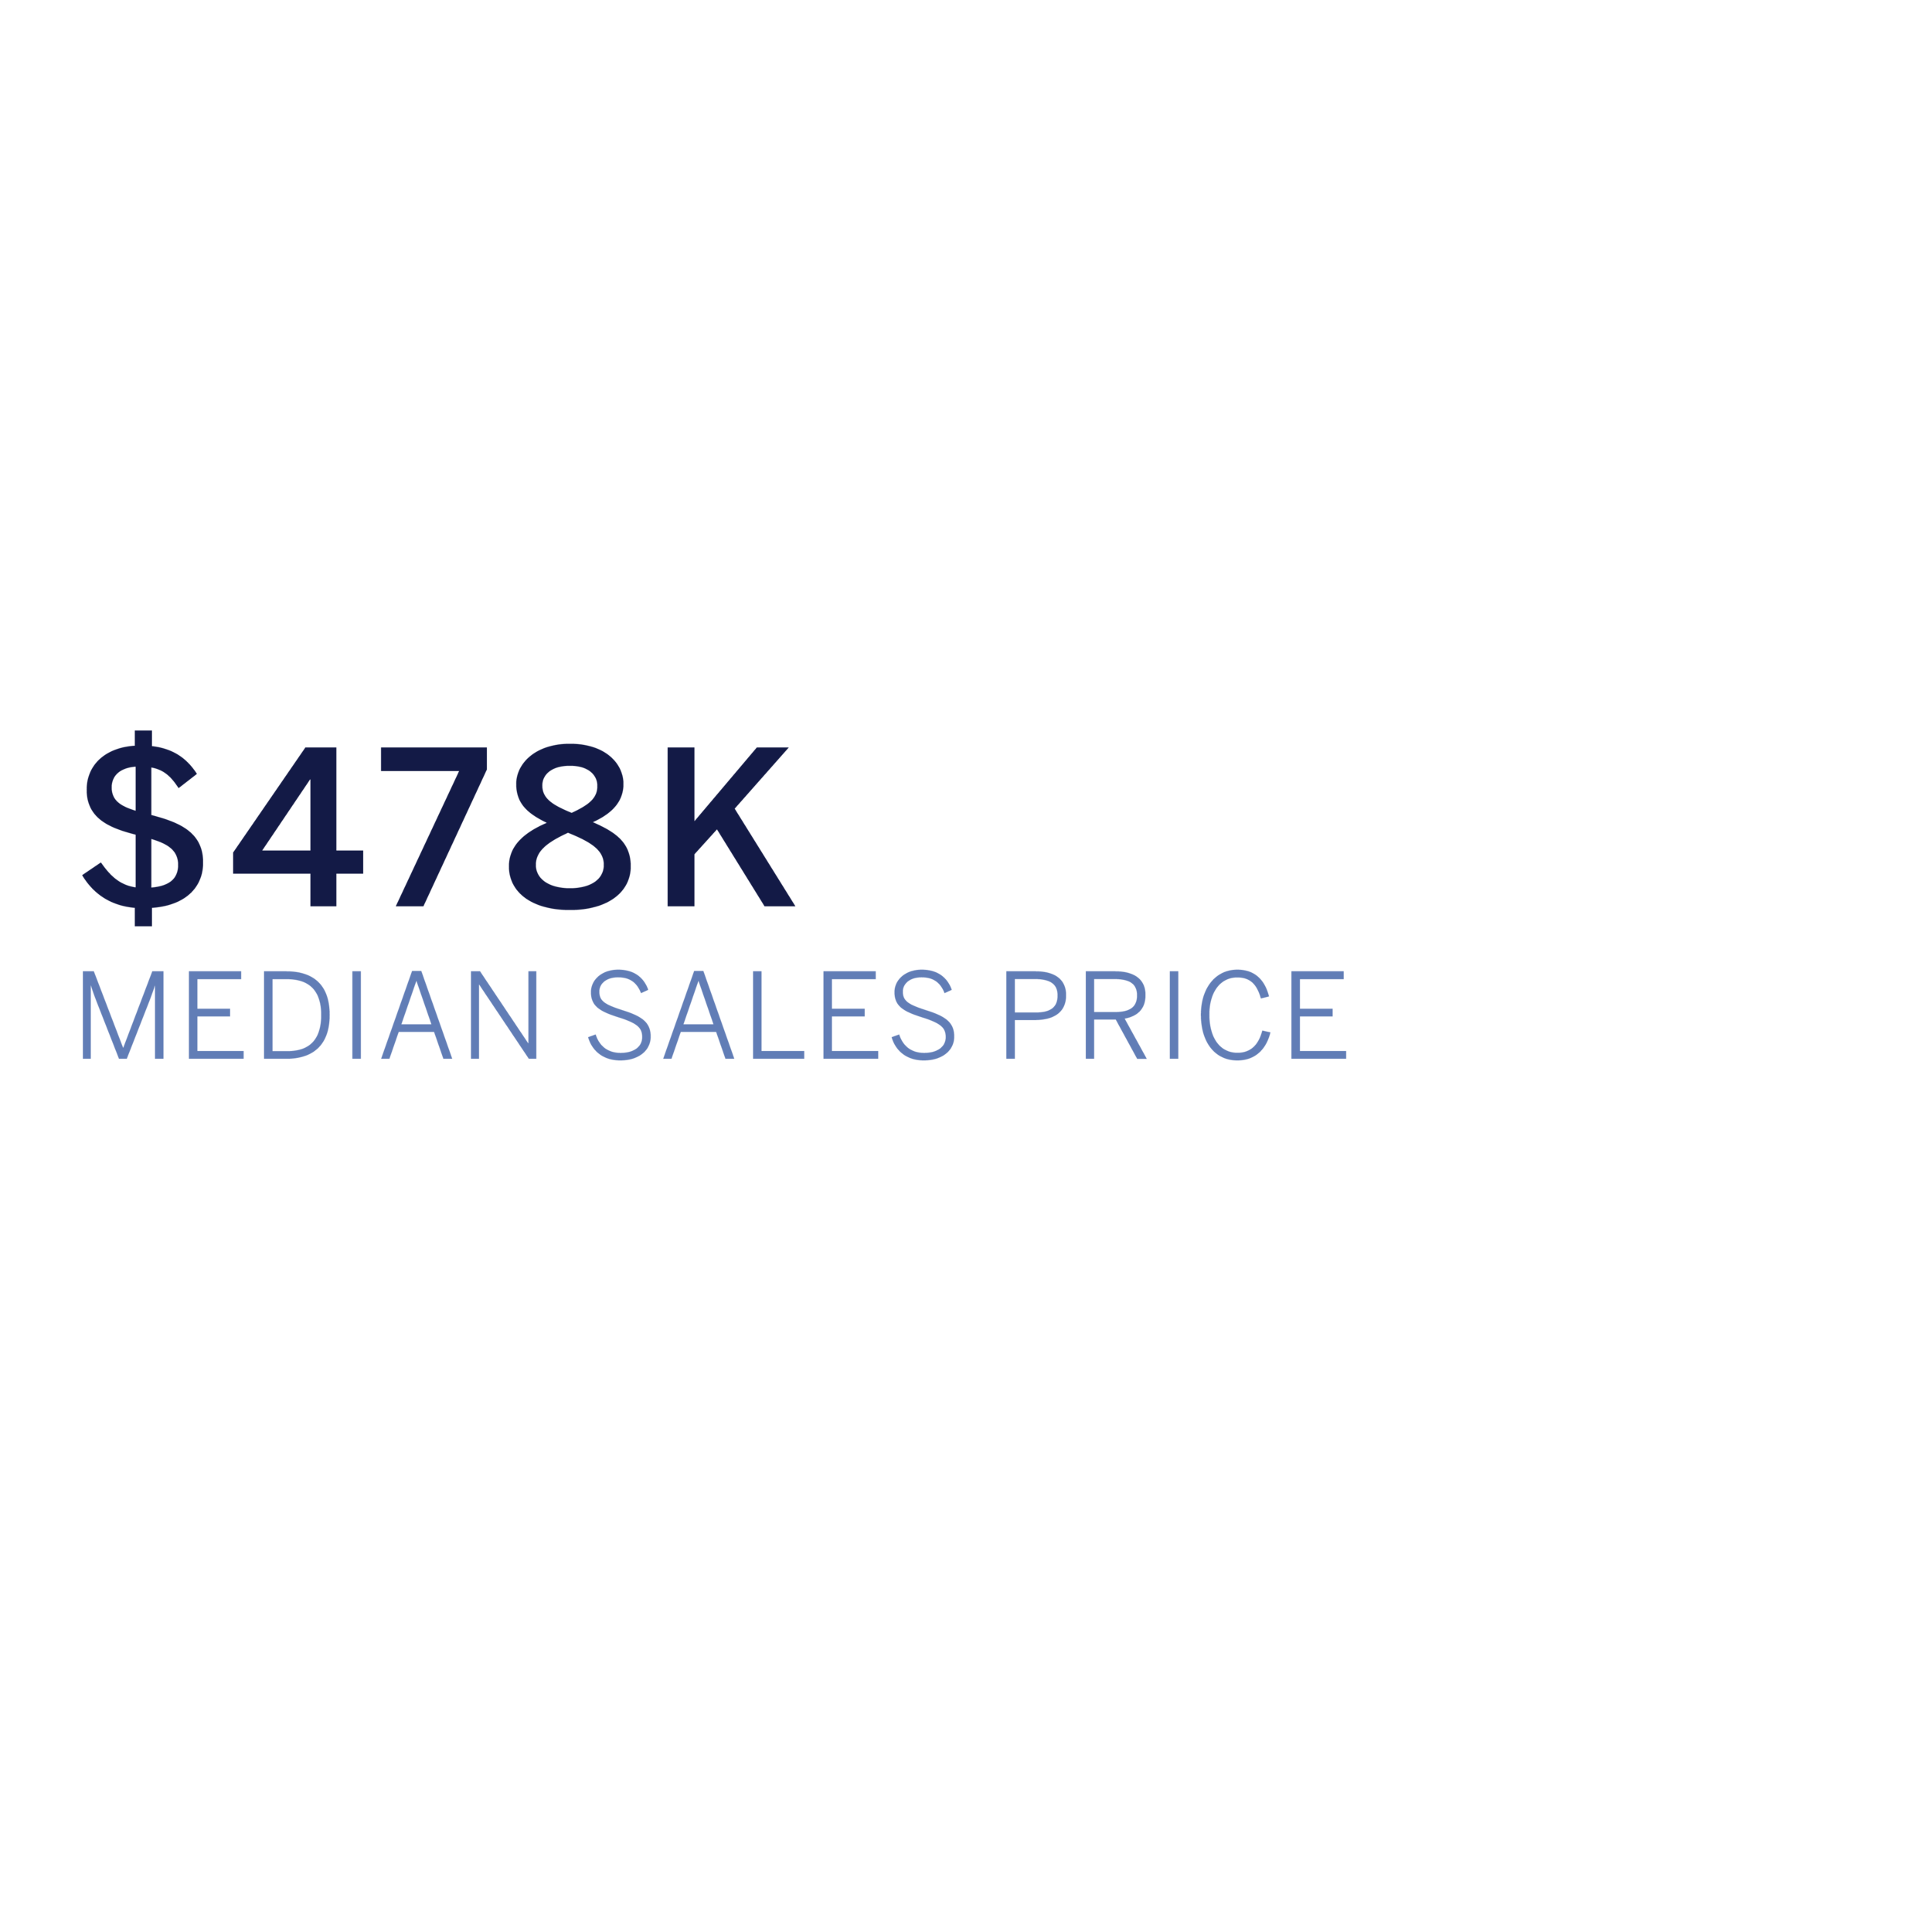 Condo Q4 Median Sales Price Label.png